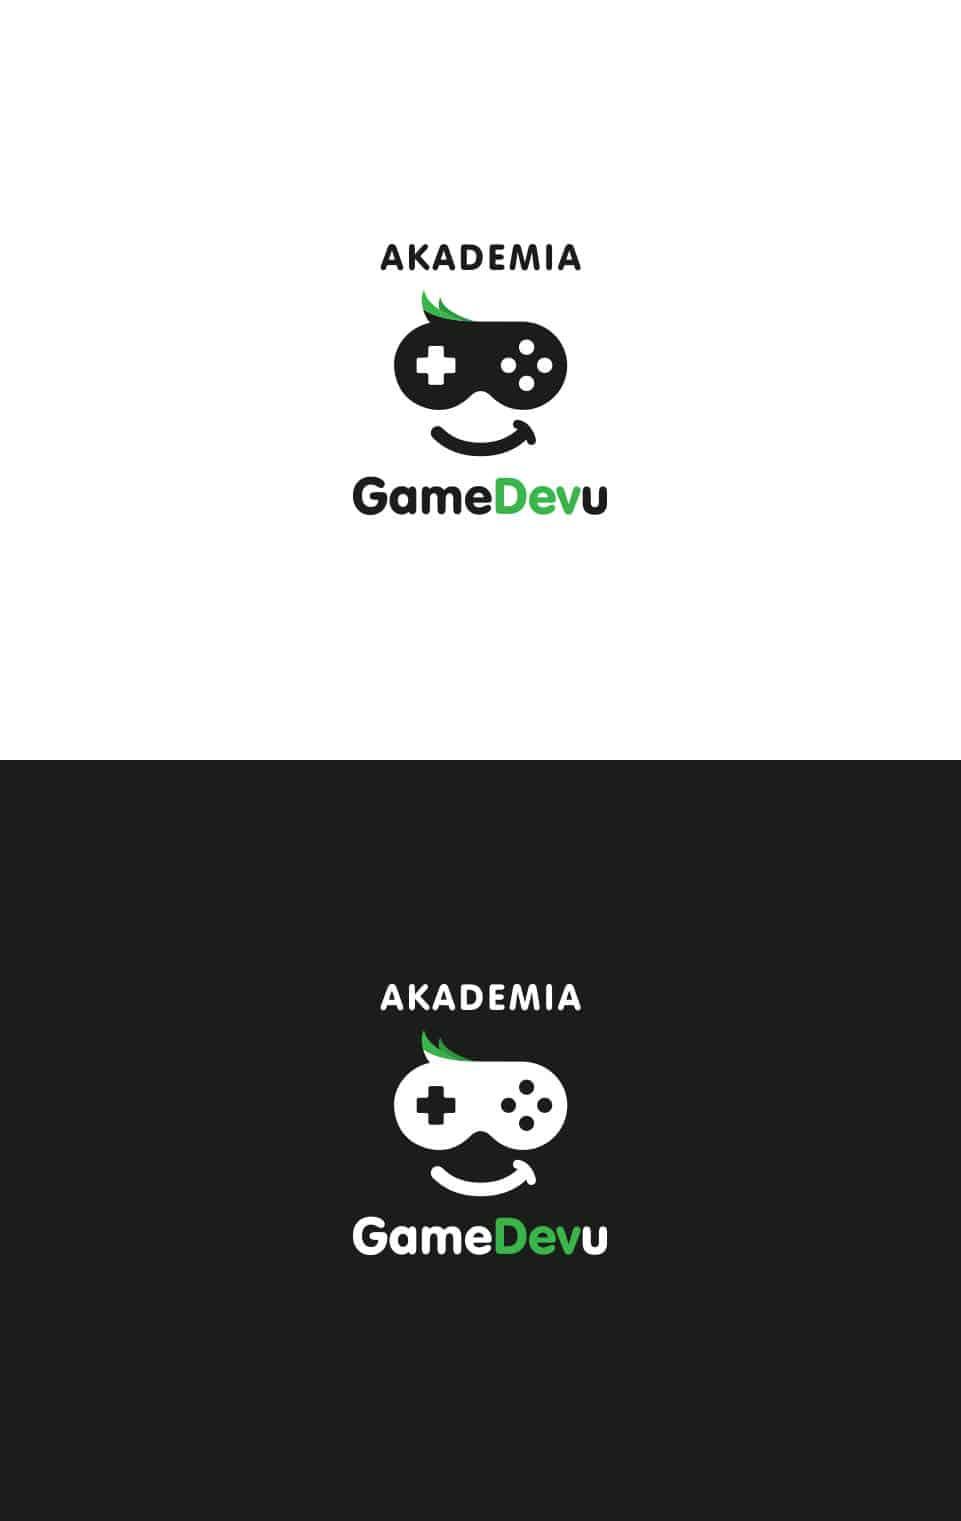 portfolio_akademiagamedevu-02